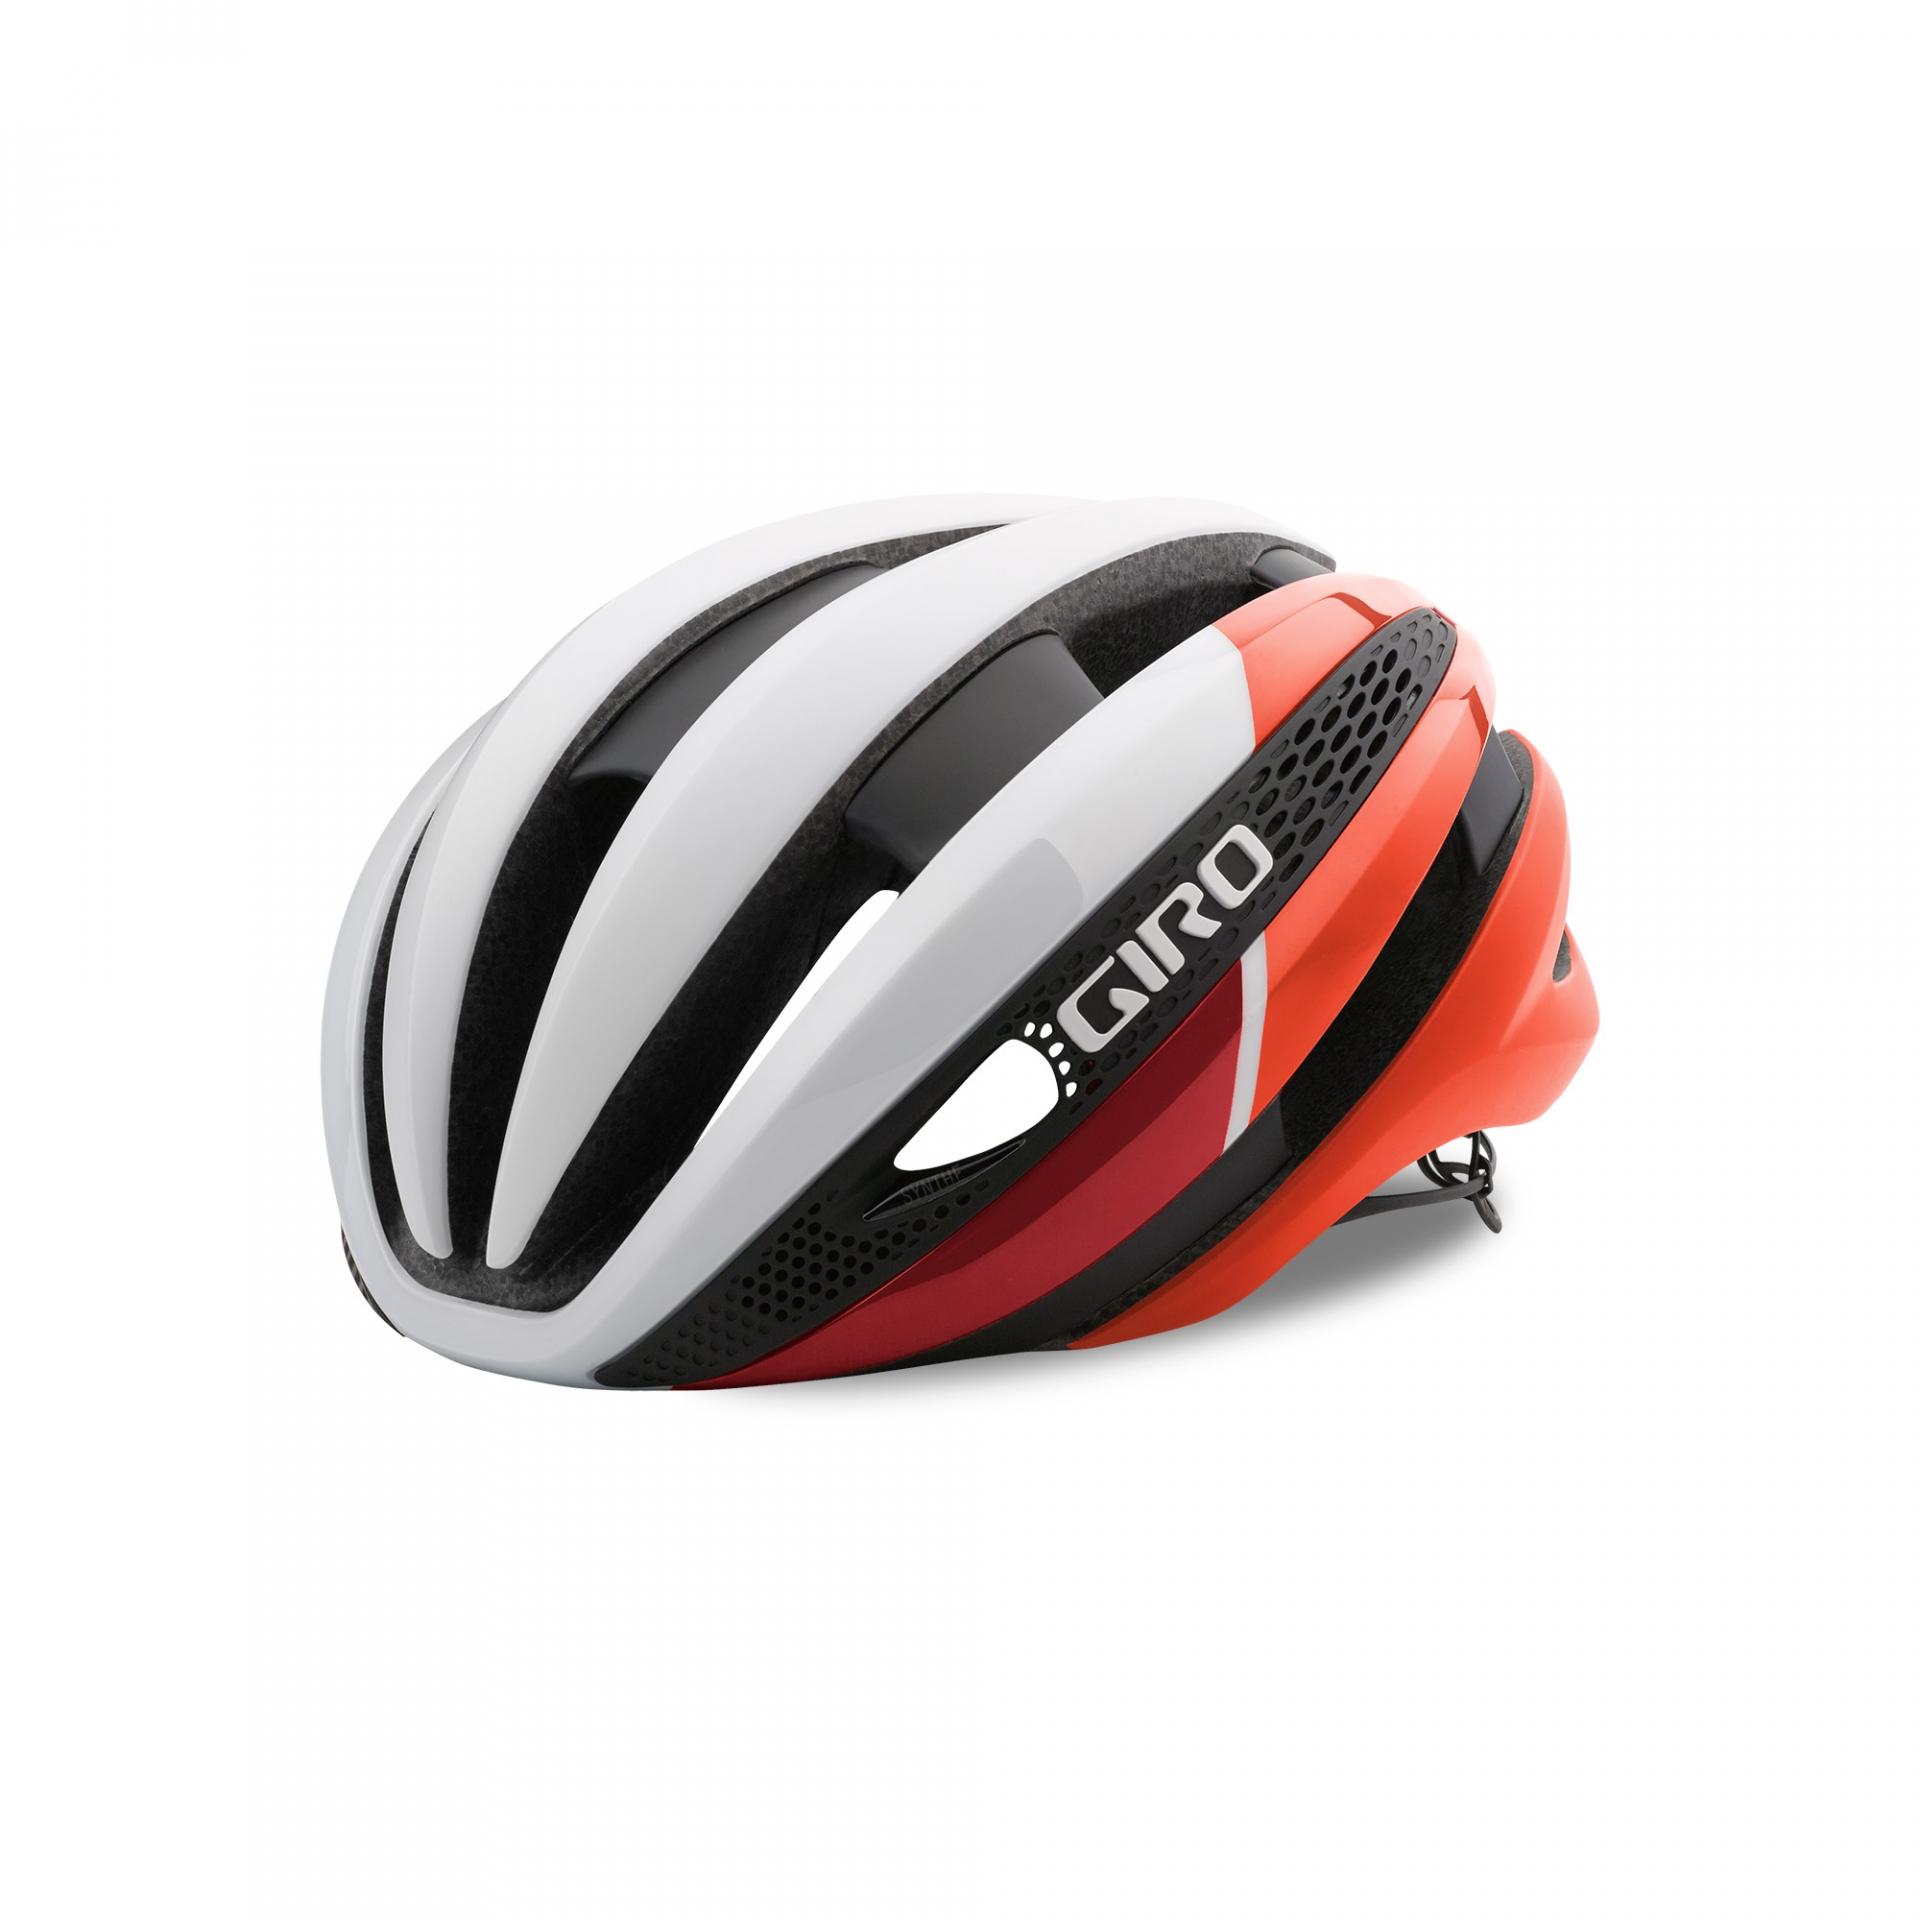 Casque Giro SYNTHE Blanc/Rouge - M / 55-59 cm